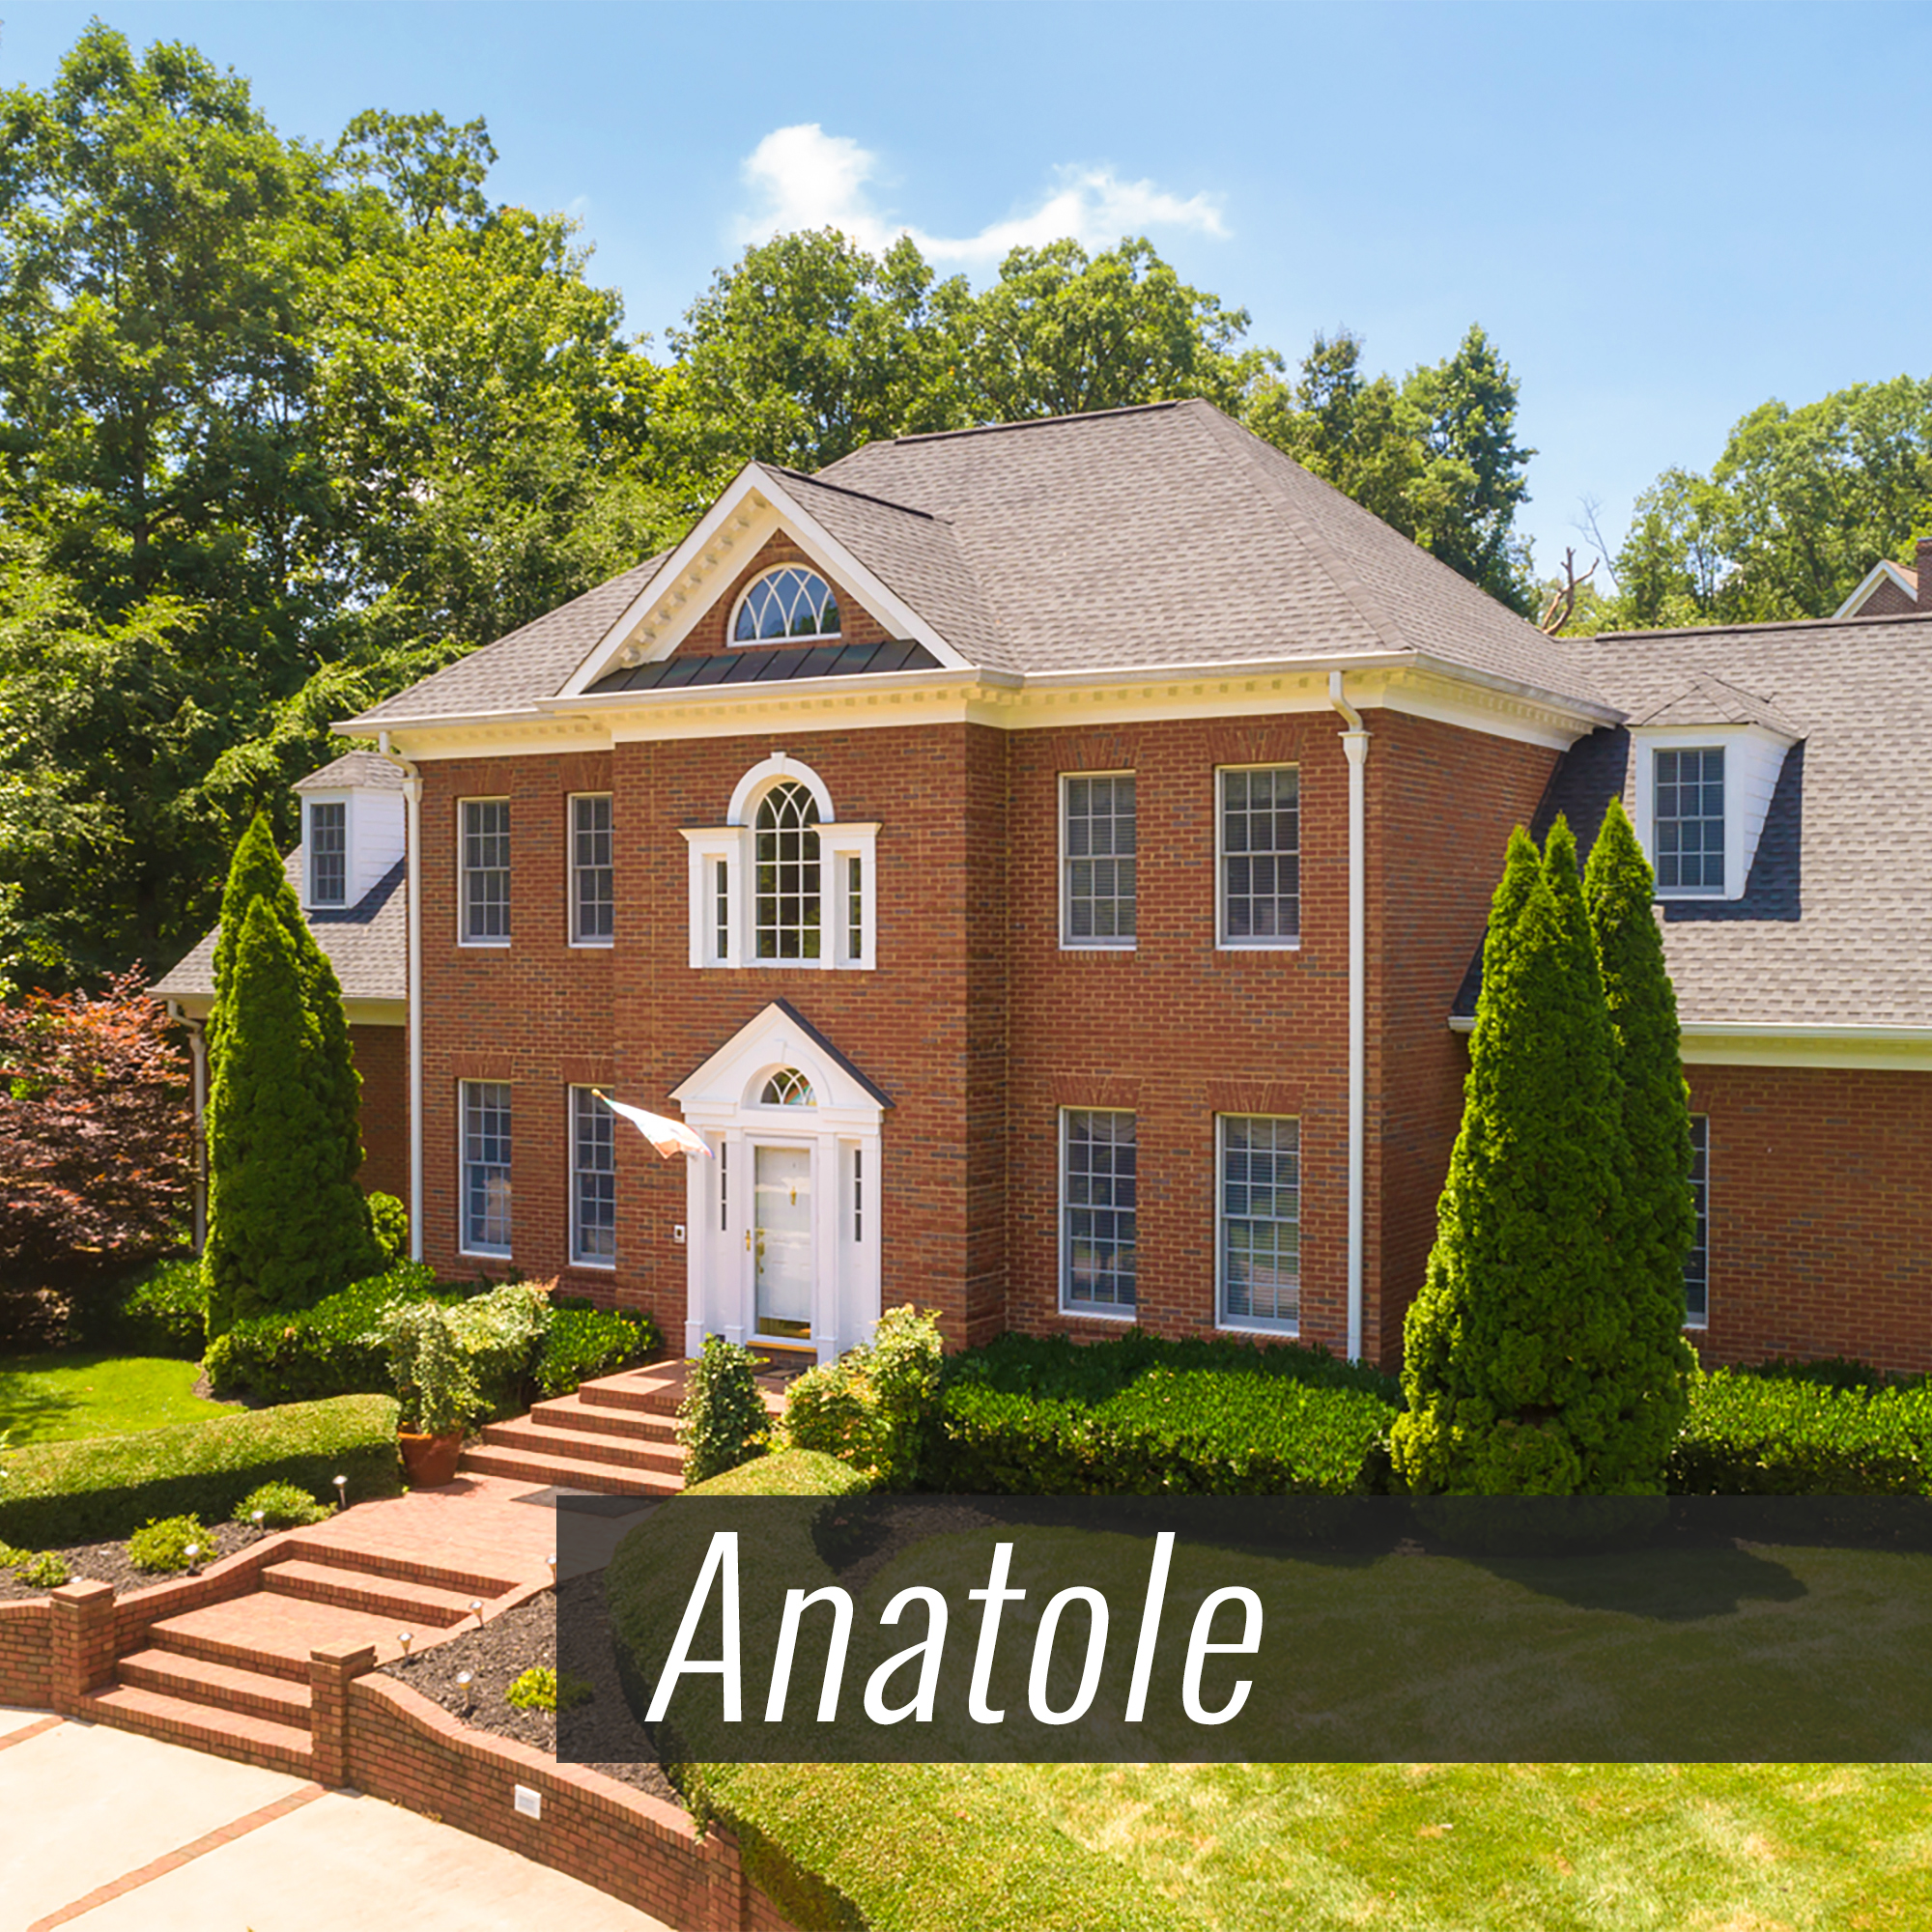 Homes for Sale in Anatole Subdivision